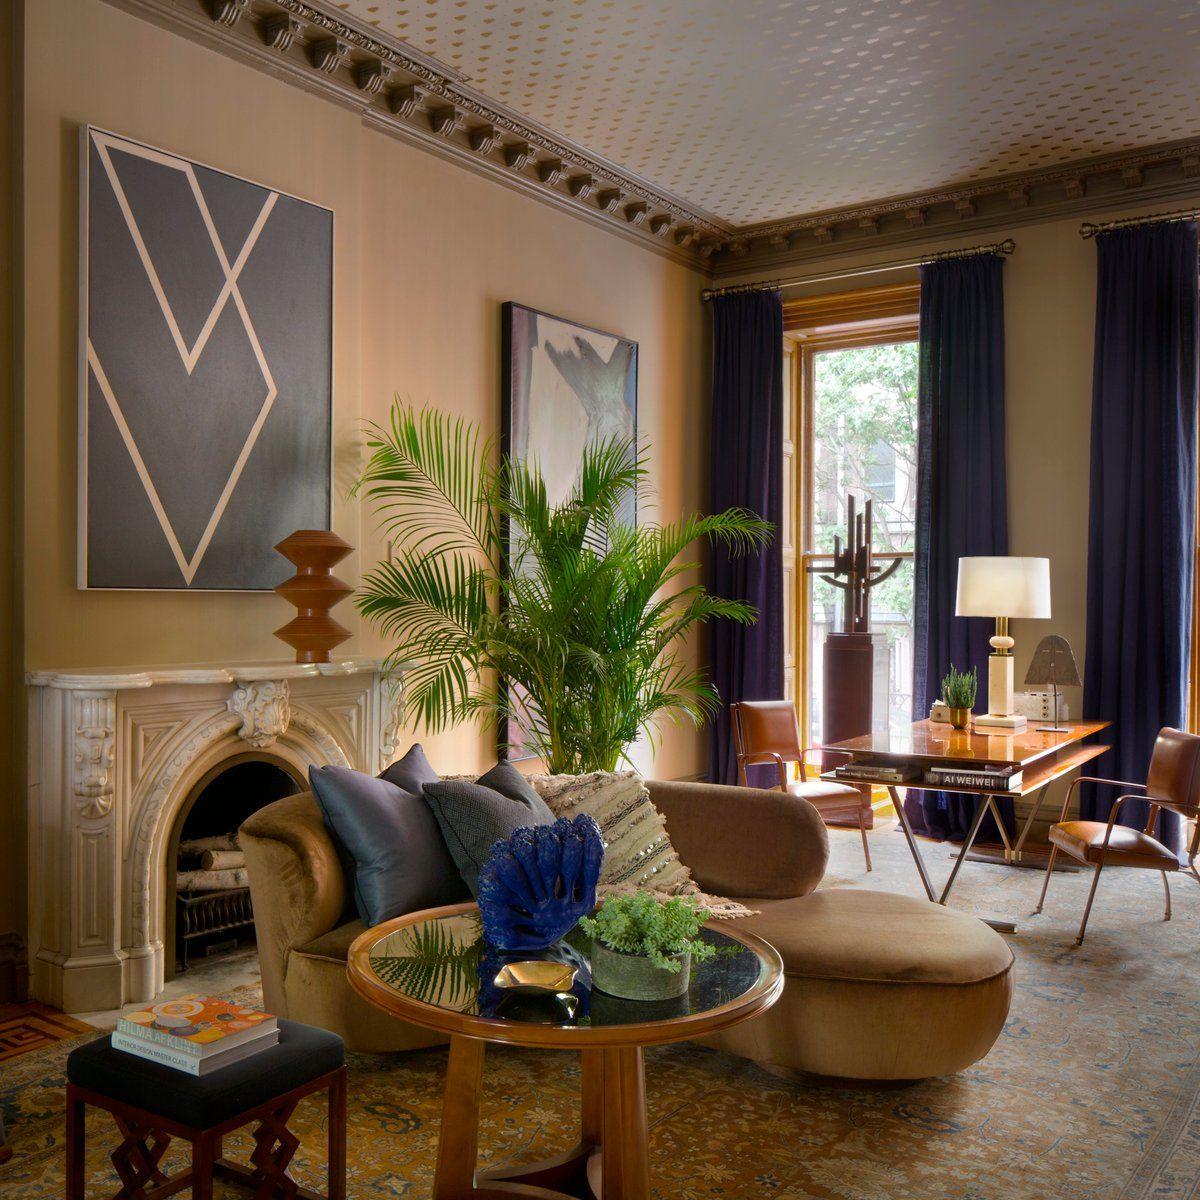 Living Room in Brooklyn, NY by Glenn Gissler Design   Decor Ideas ...